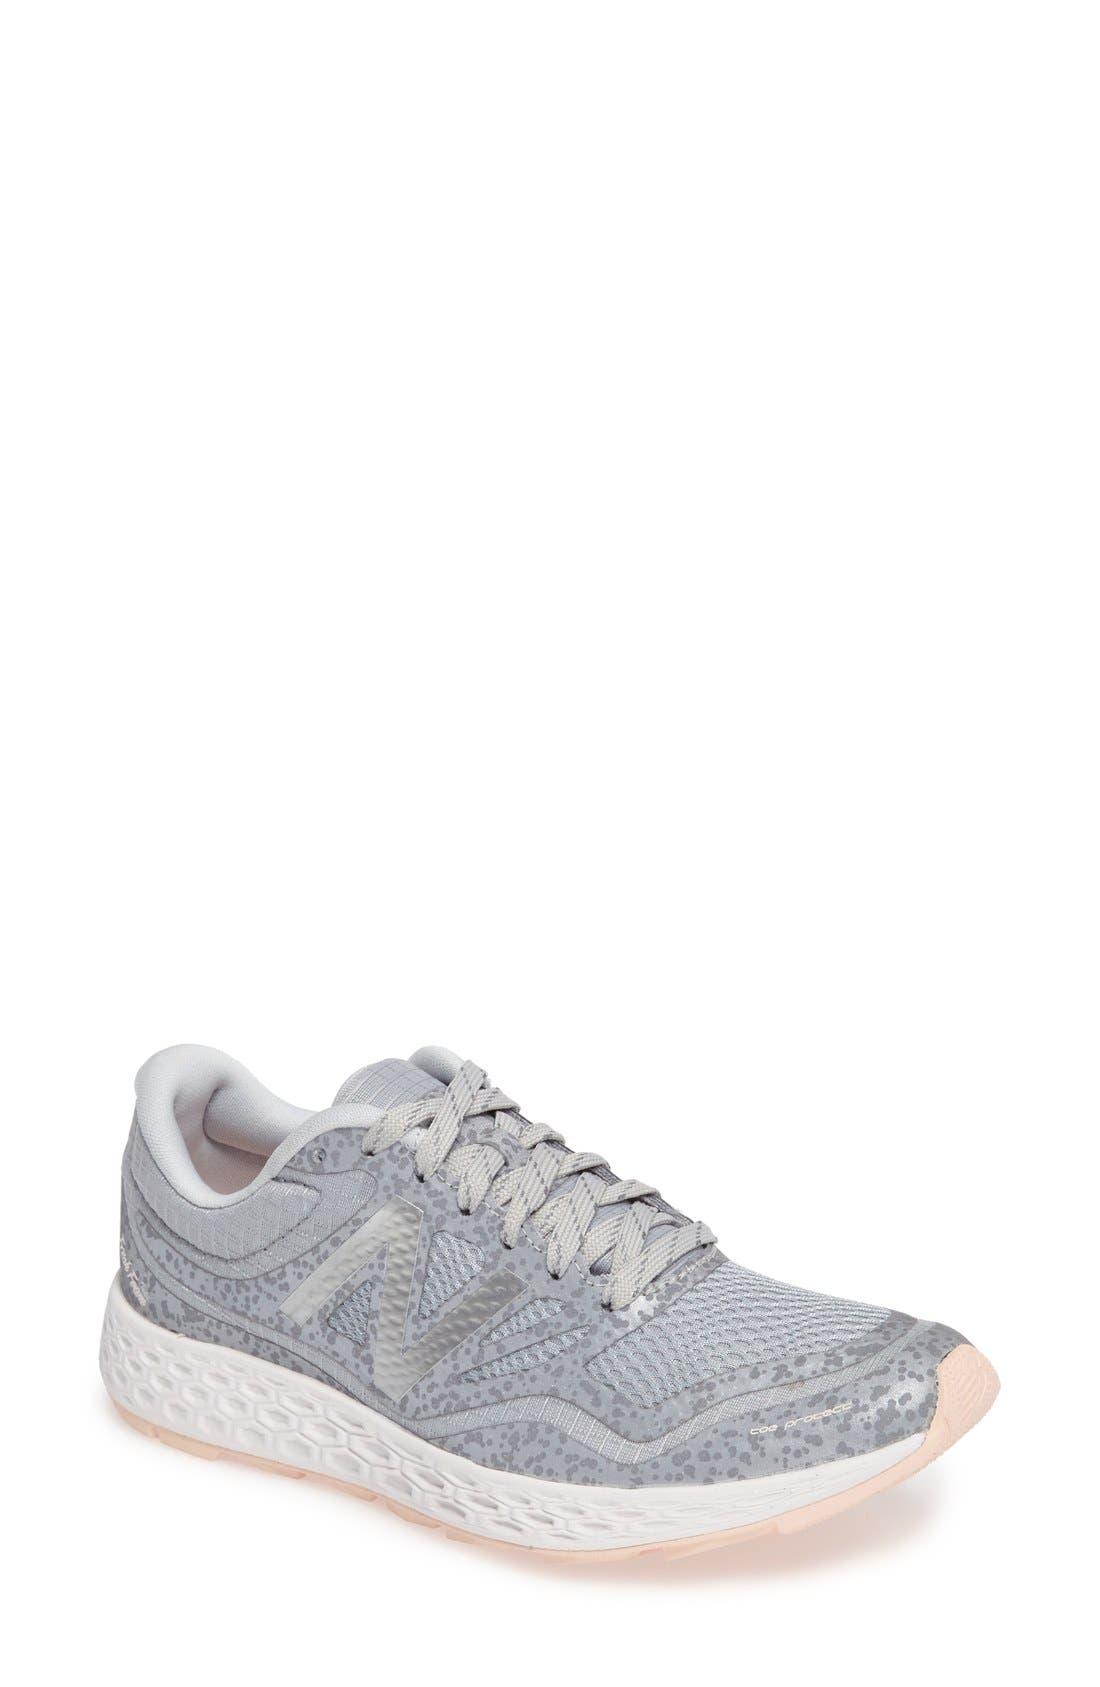 Main Image - New Balance Fresh Foam Gobi Trail Running Shoe